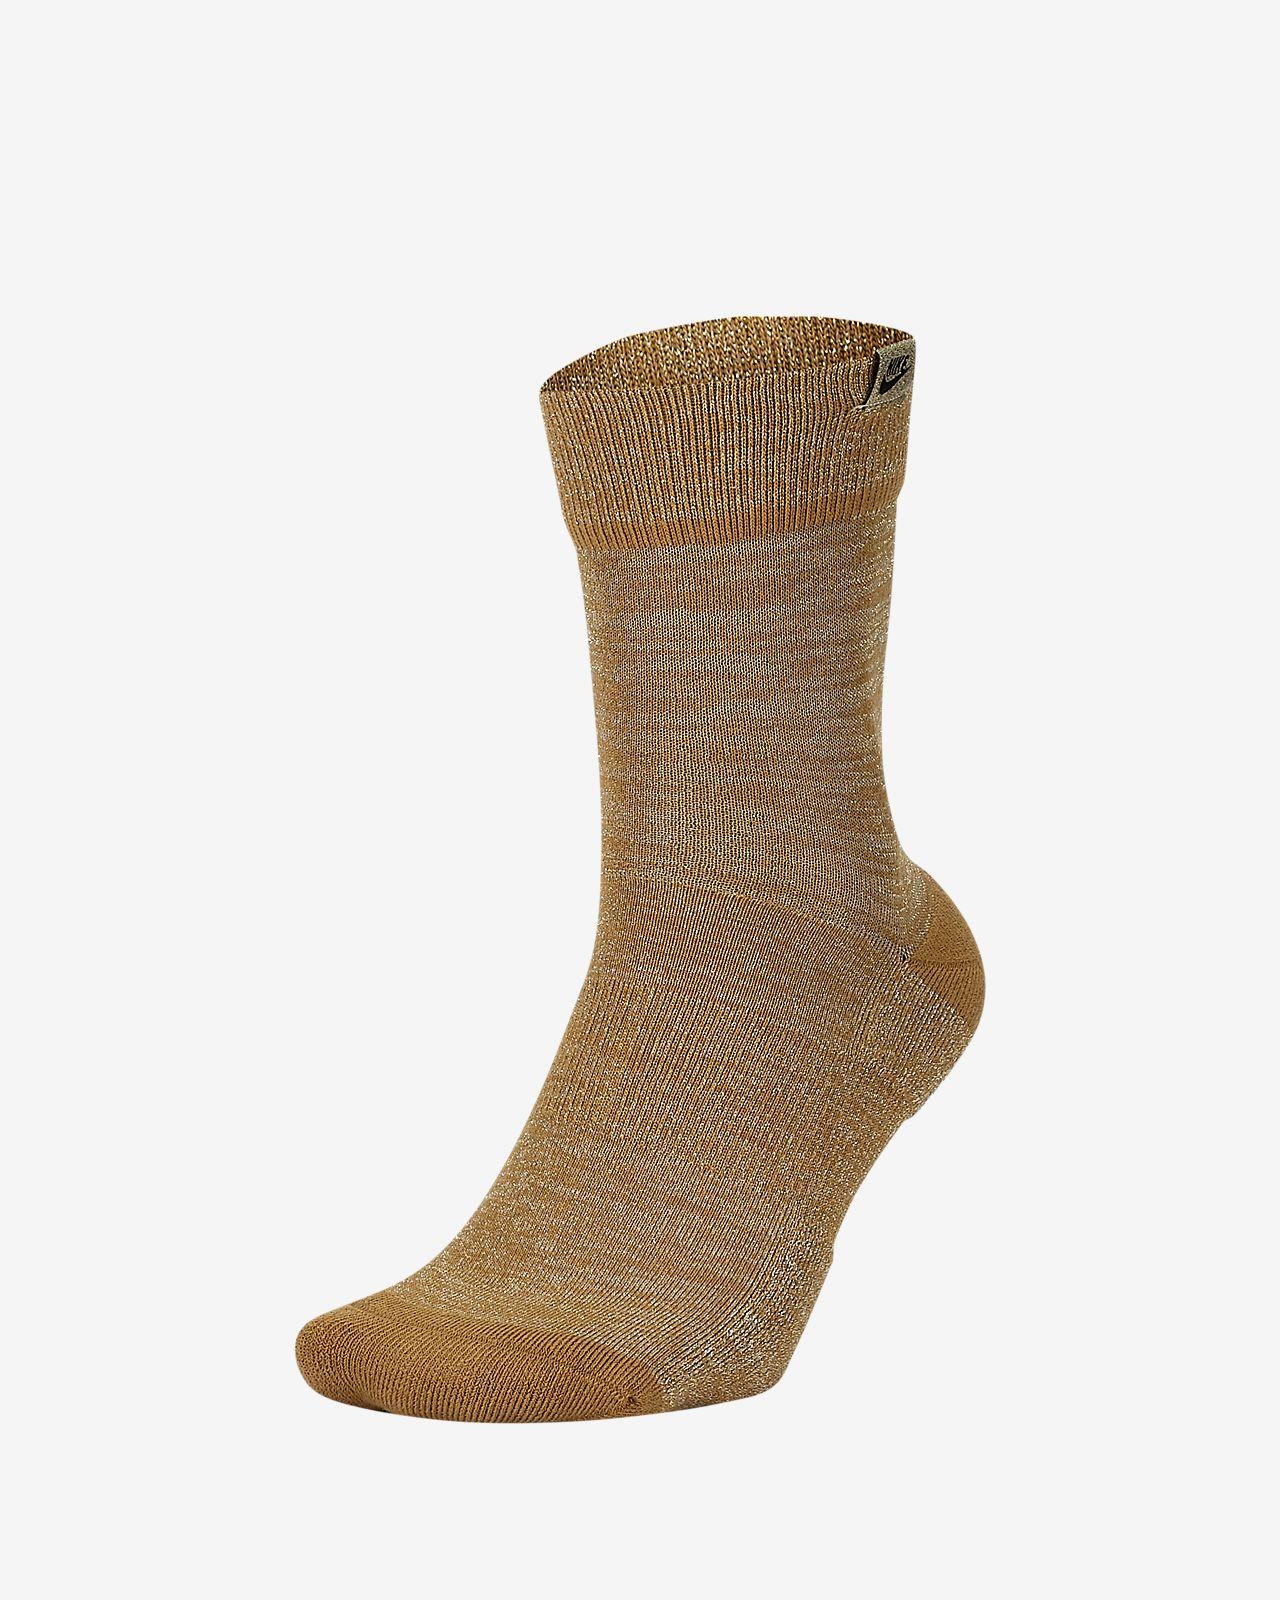 Nike SNEAKR Sox Metallic Crew-Socken